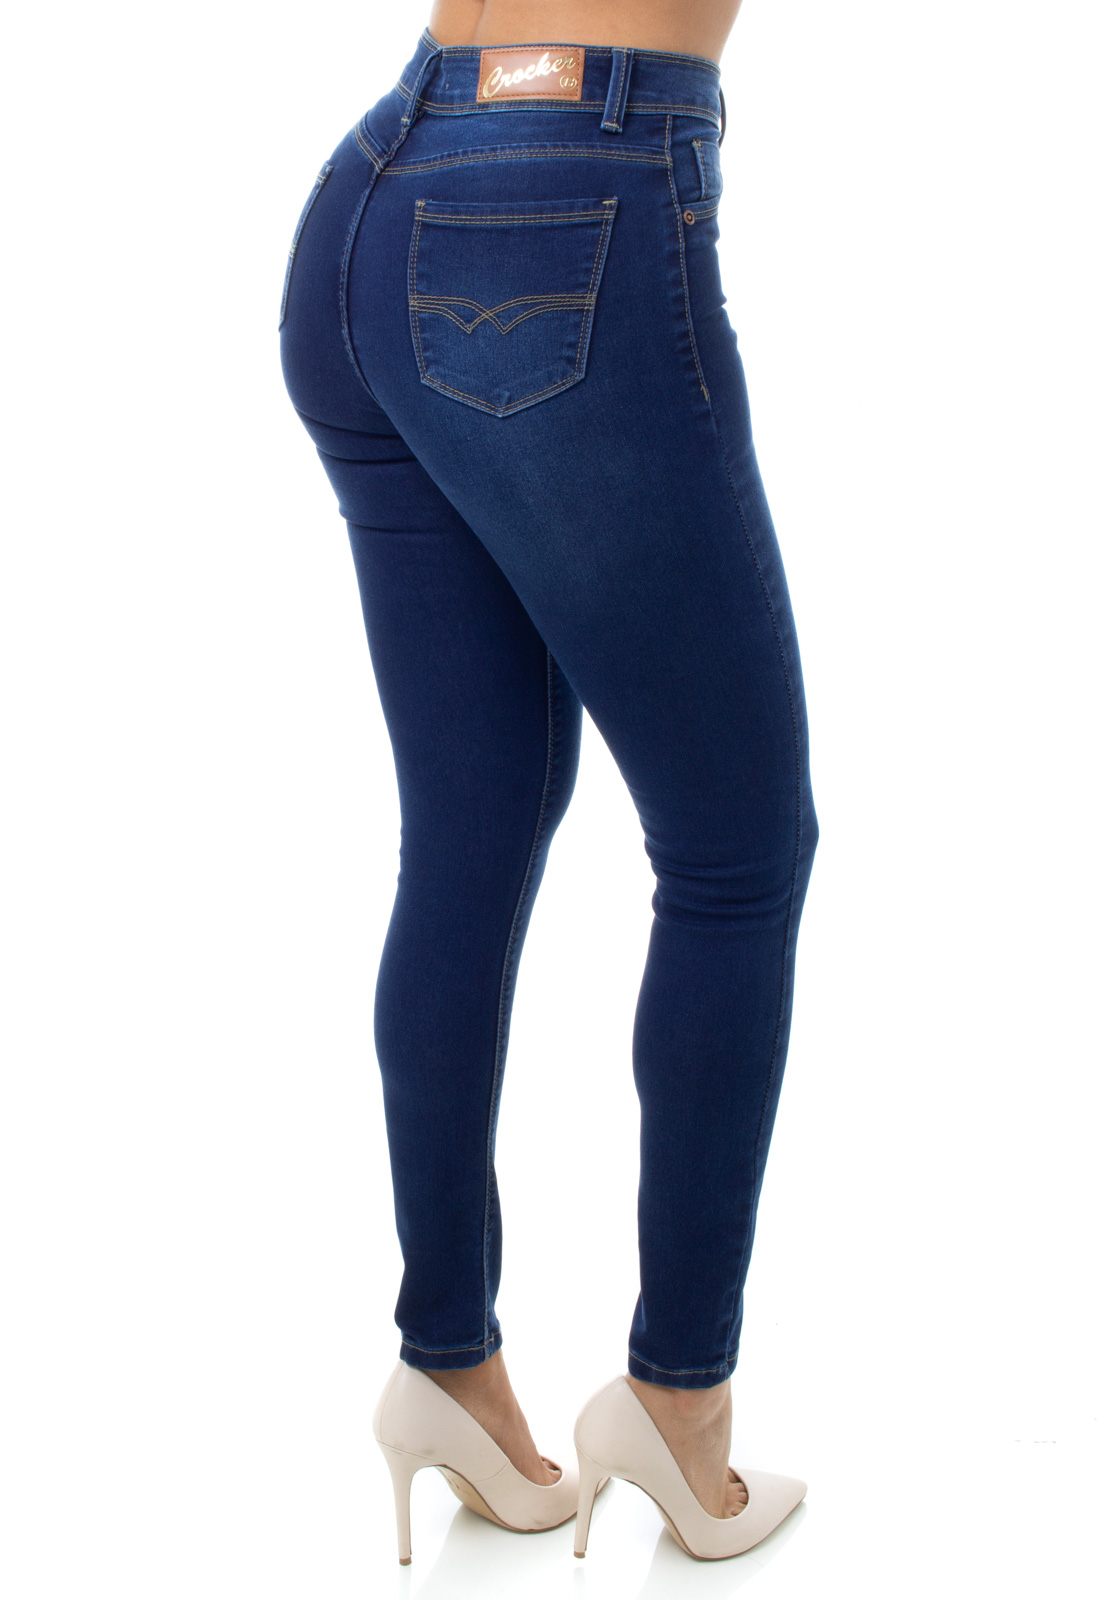 Calça  Jeans Feminina Skinny Crocker - 48176  - CROCKER JEANS